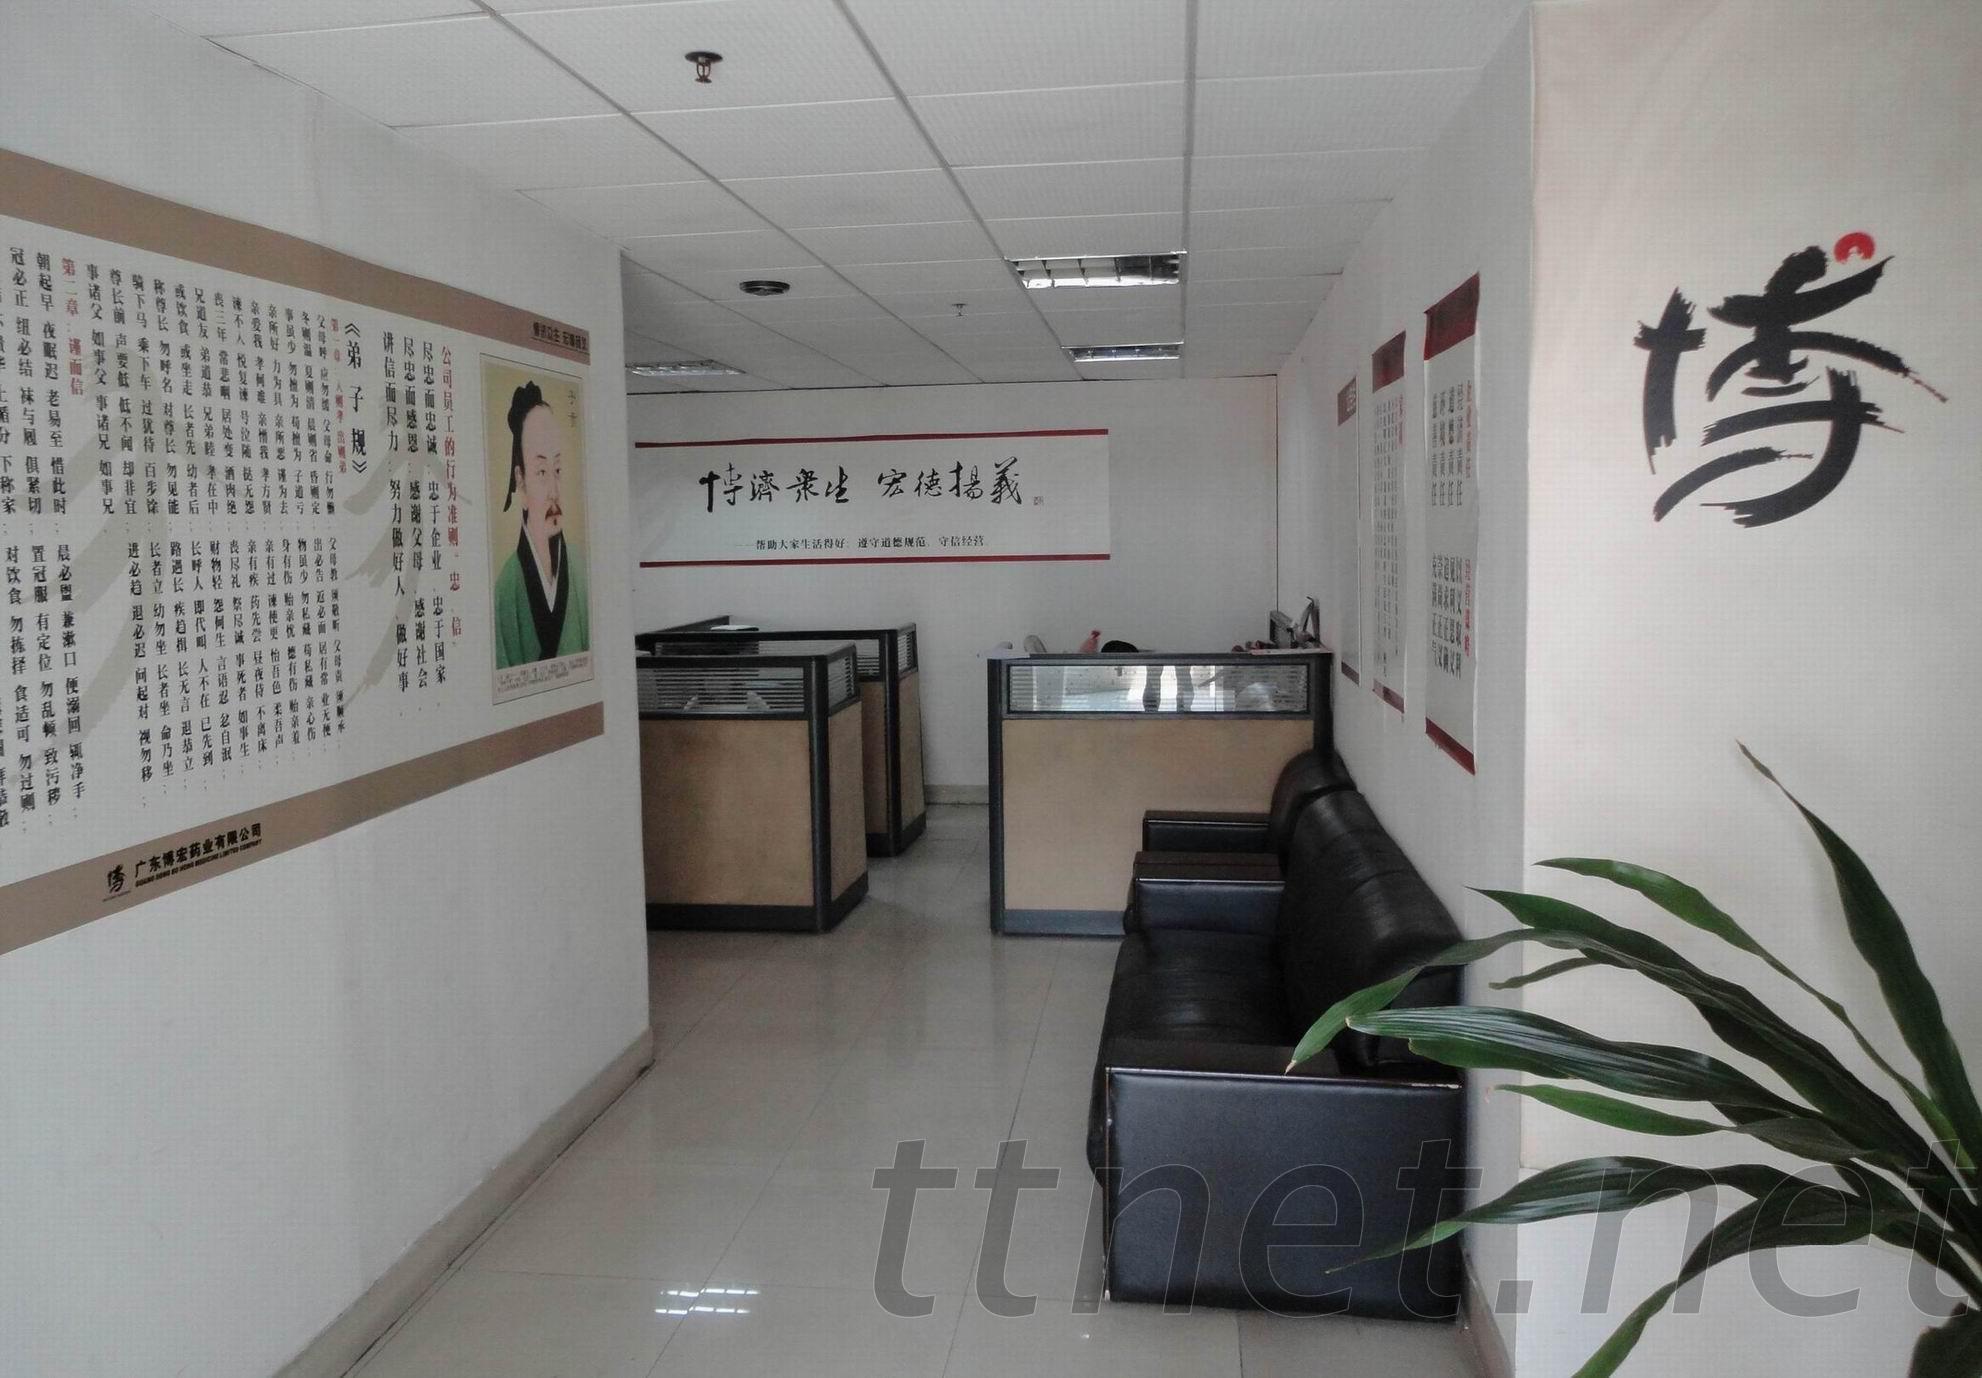 Guangdong Bohong Medicine Co., Ltd.